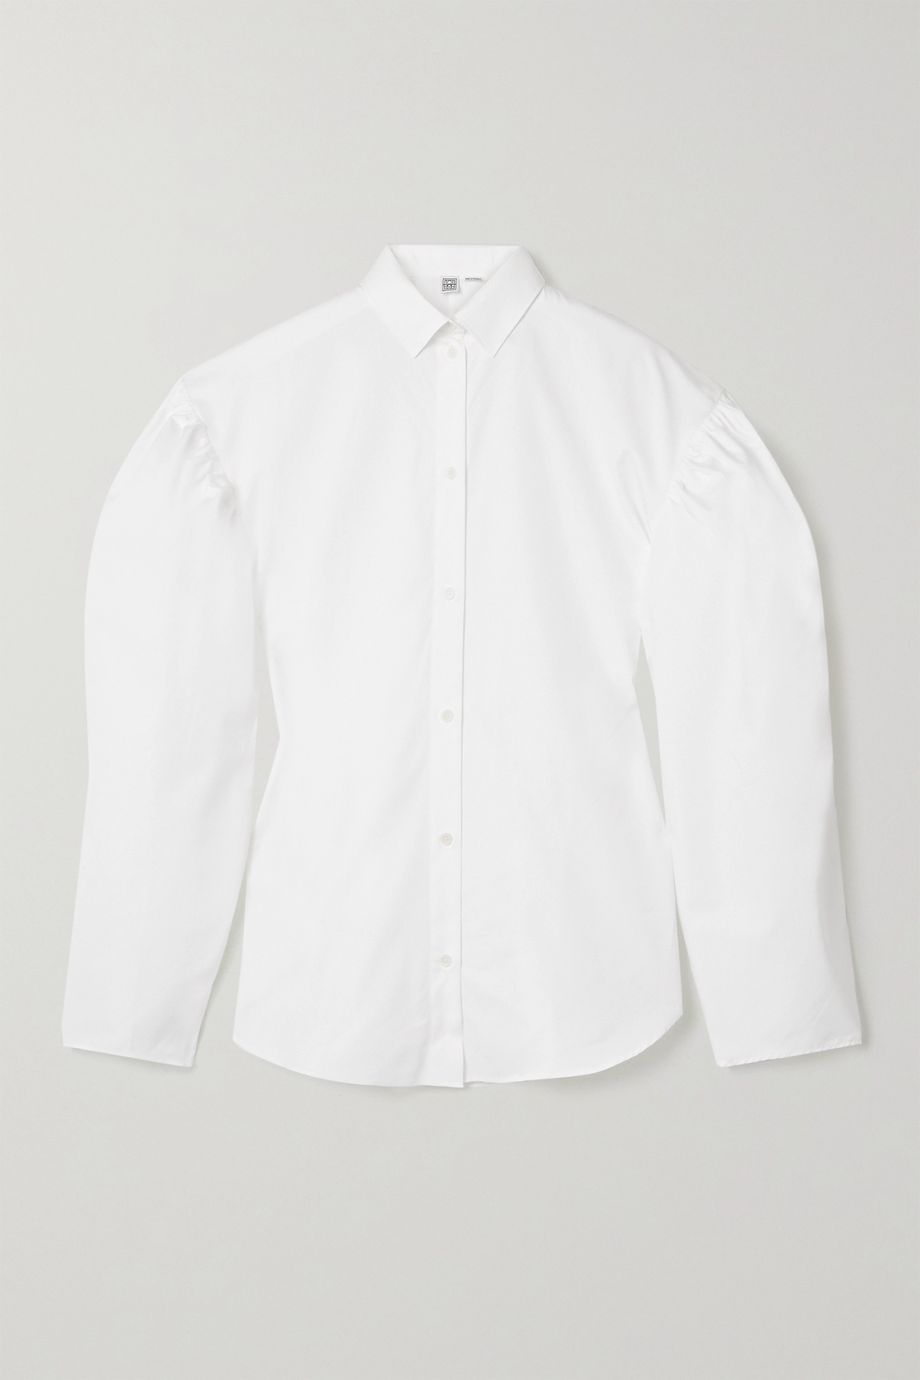 Totême Zonza cotton-poplin shirt